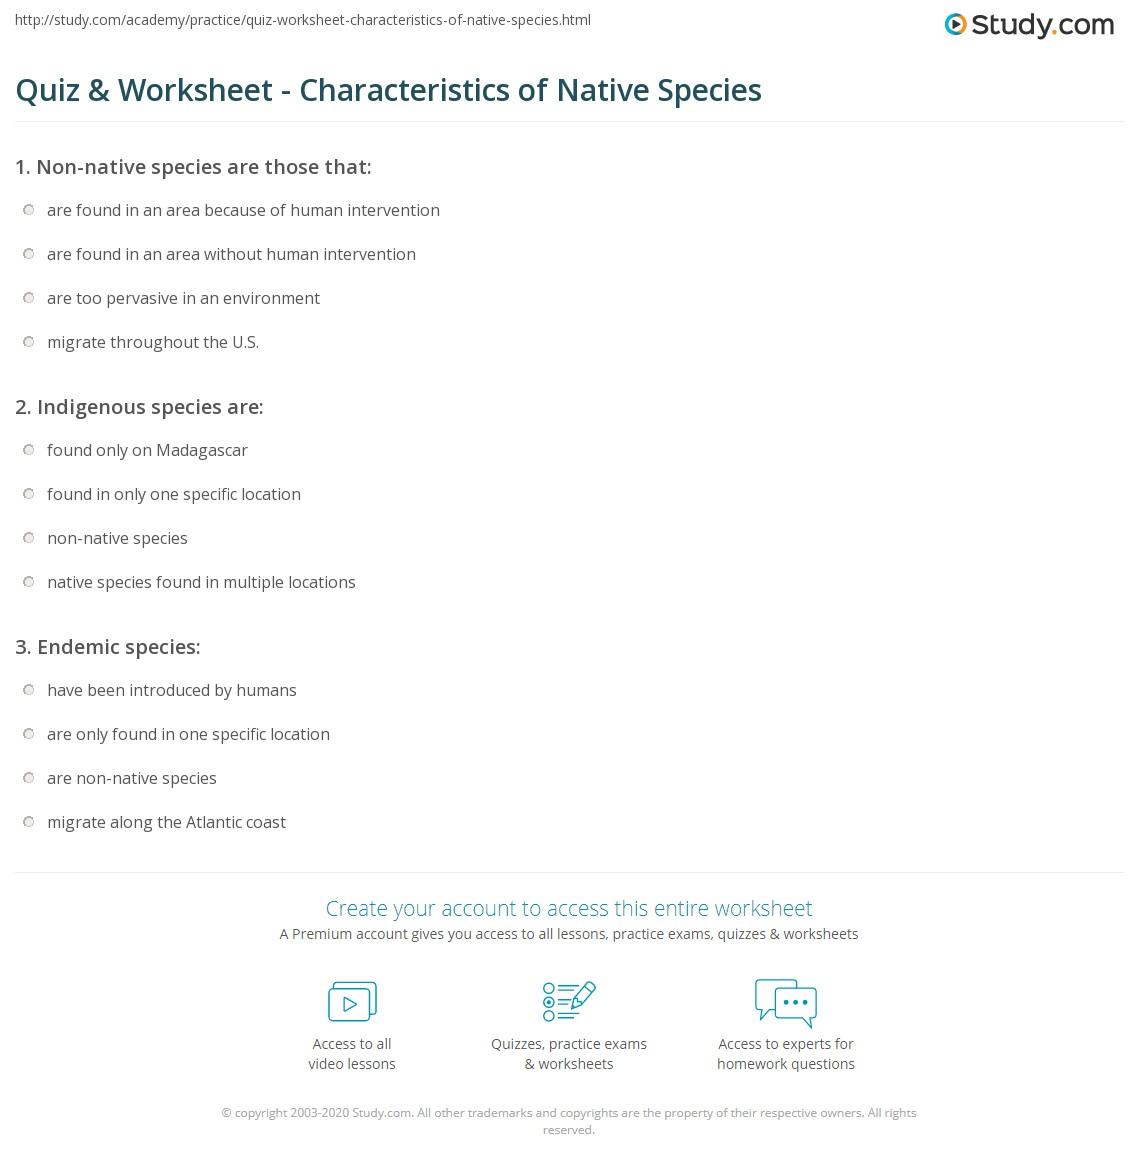 quiz & worksheet - characteristics of native species | study